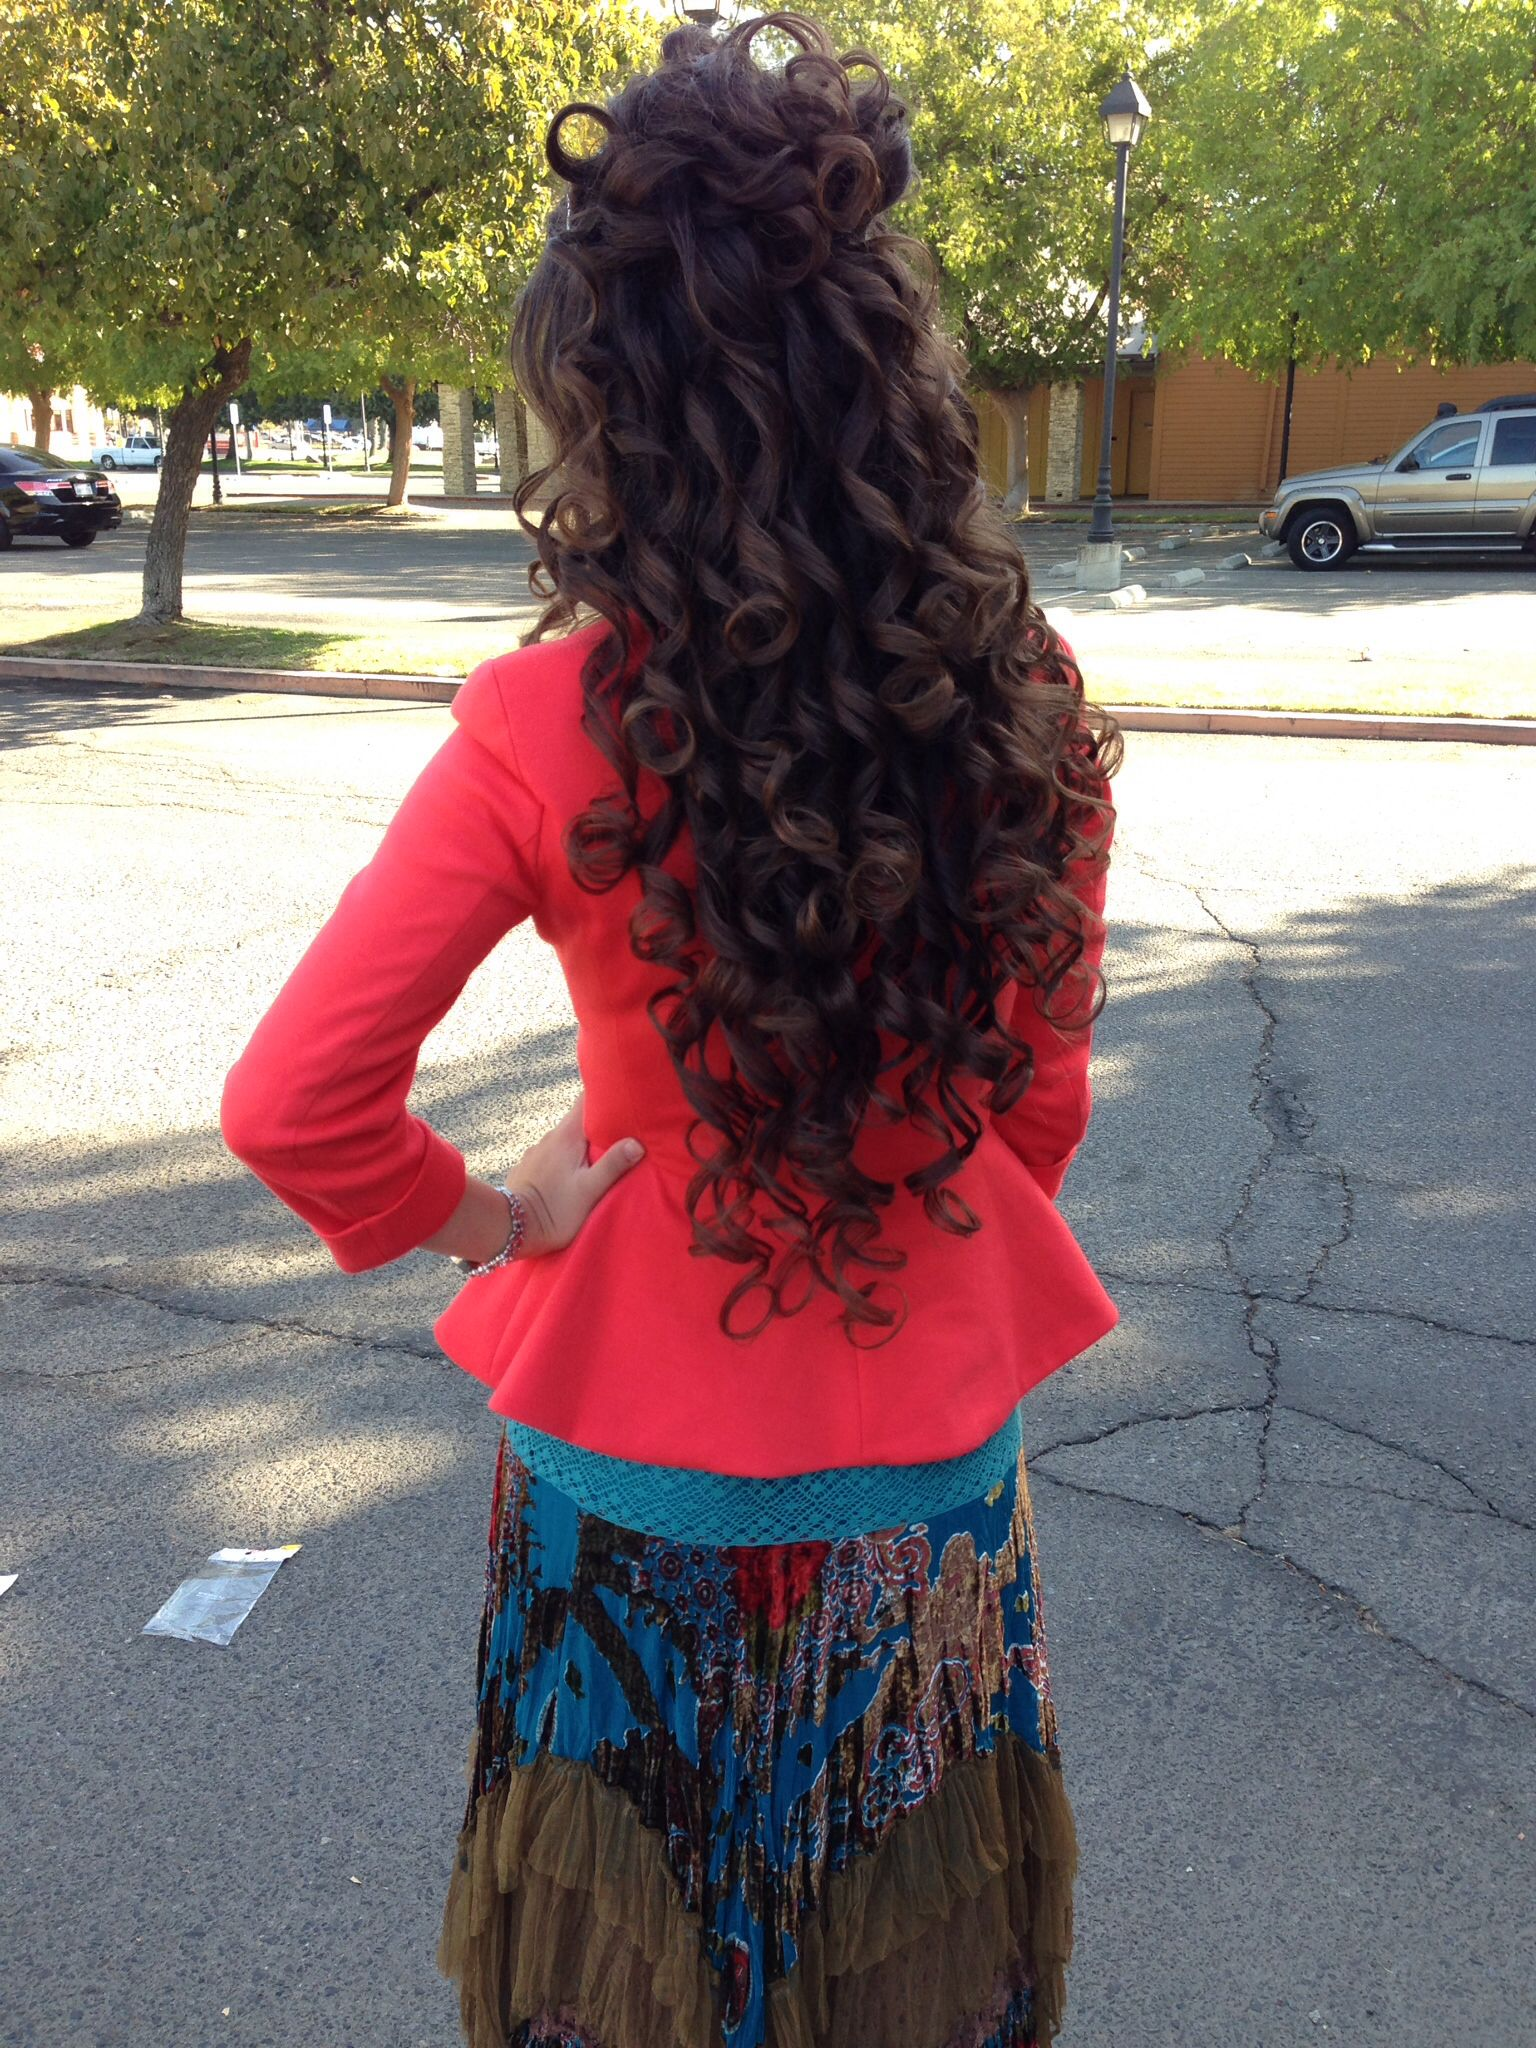 Ha Hair Accessories For Apostolic Long Hair - Hot rollers make beautiful curls apostolic hair